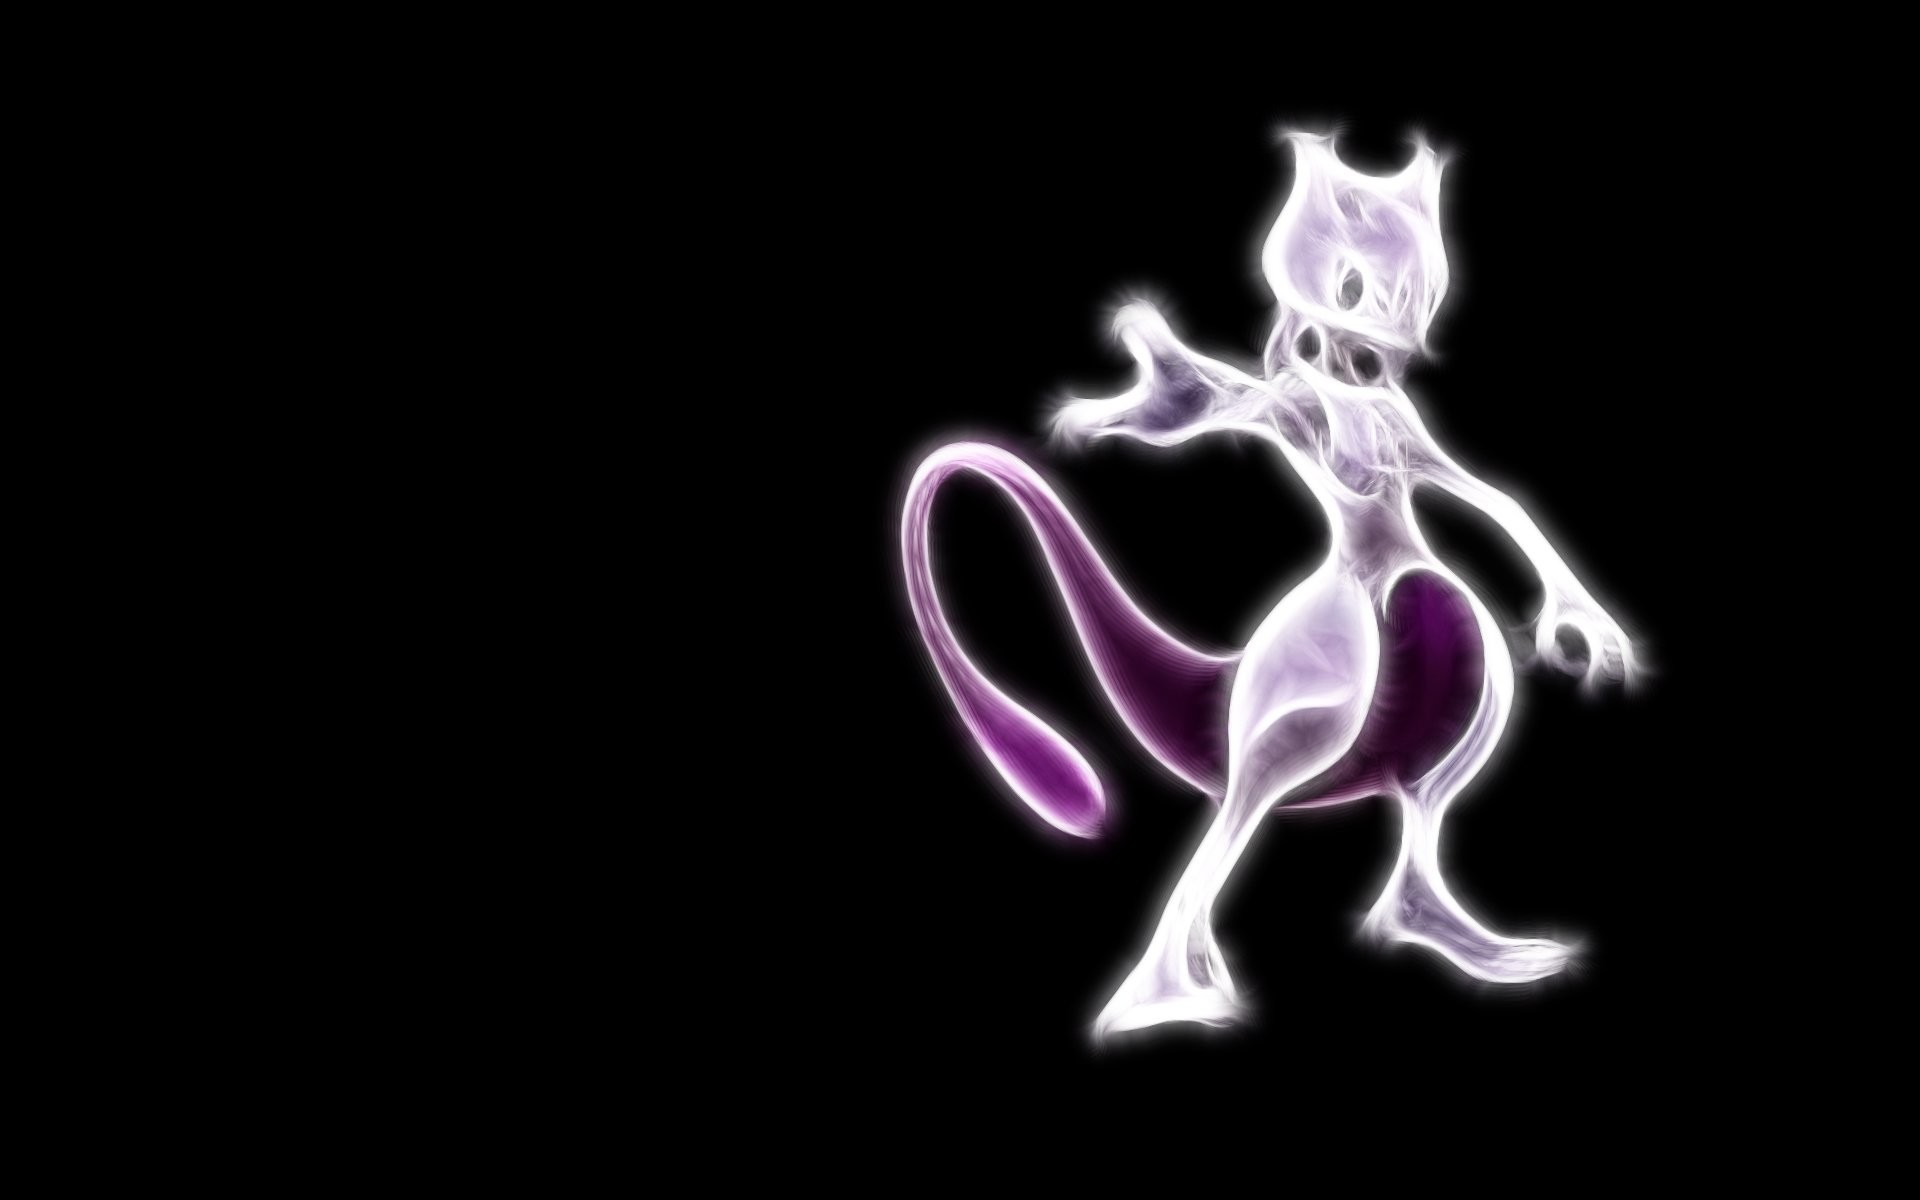 HD Wallpaper   Background ID:75420. Video Game Pokémon